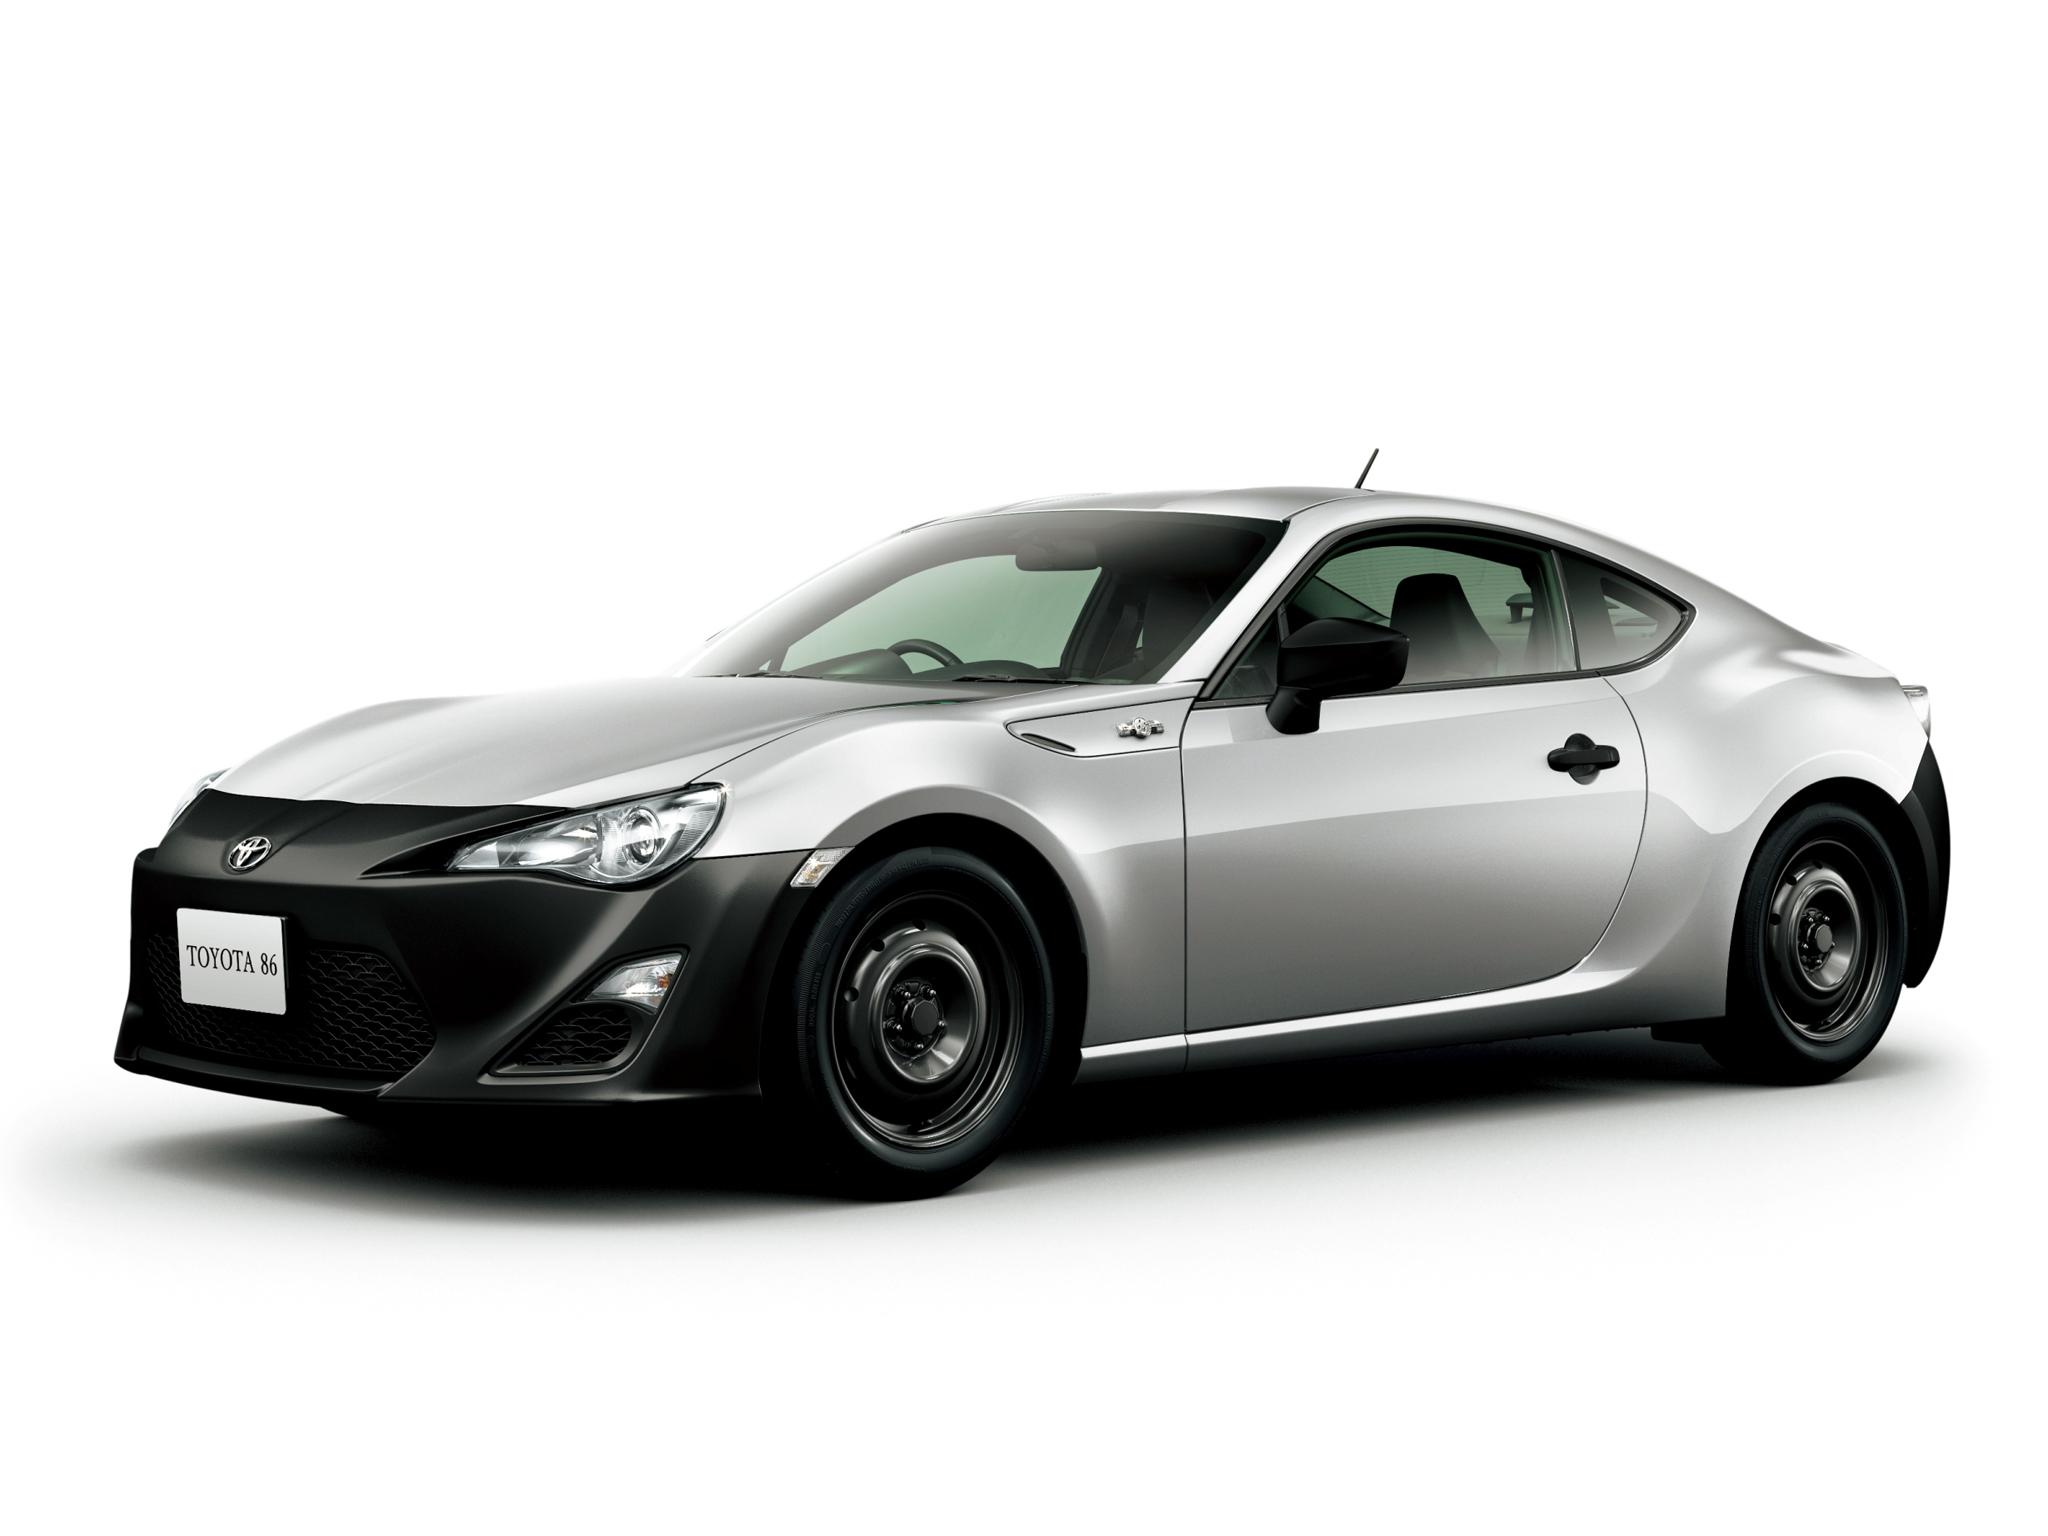 Toyota RC 1